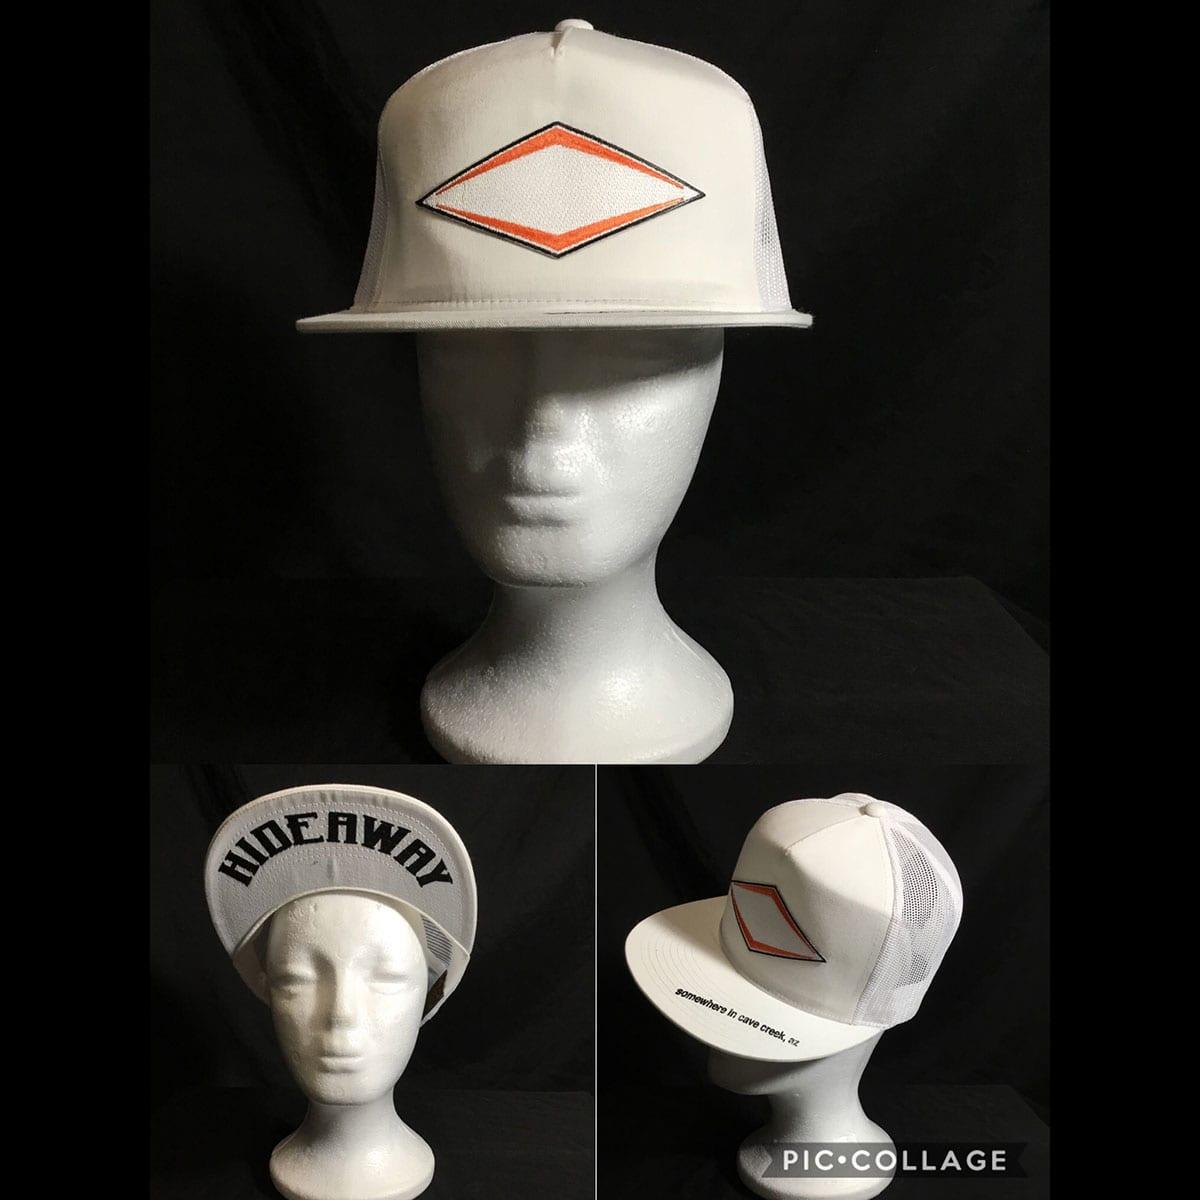 The Hideaway Grill - Cave Creek: Ghost Logo Baseball Cap - White